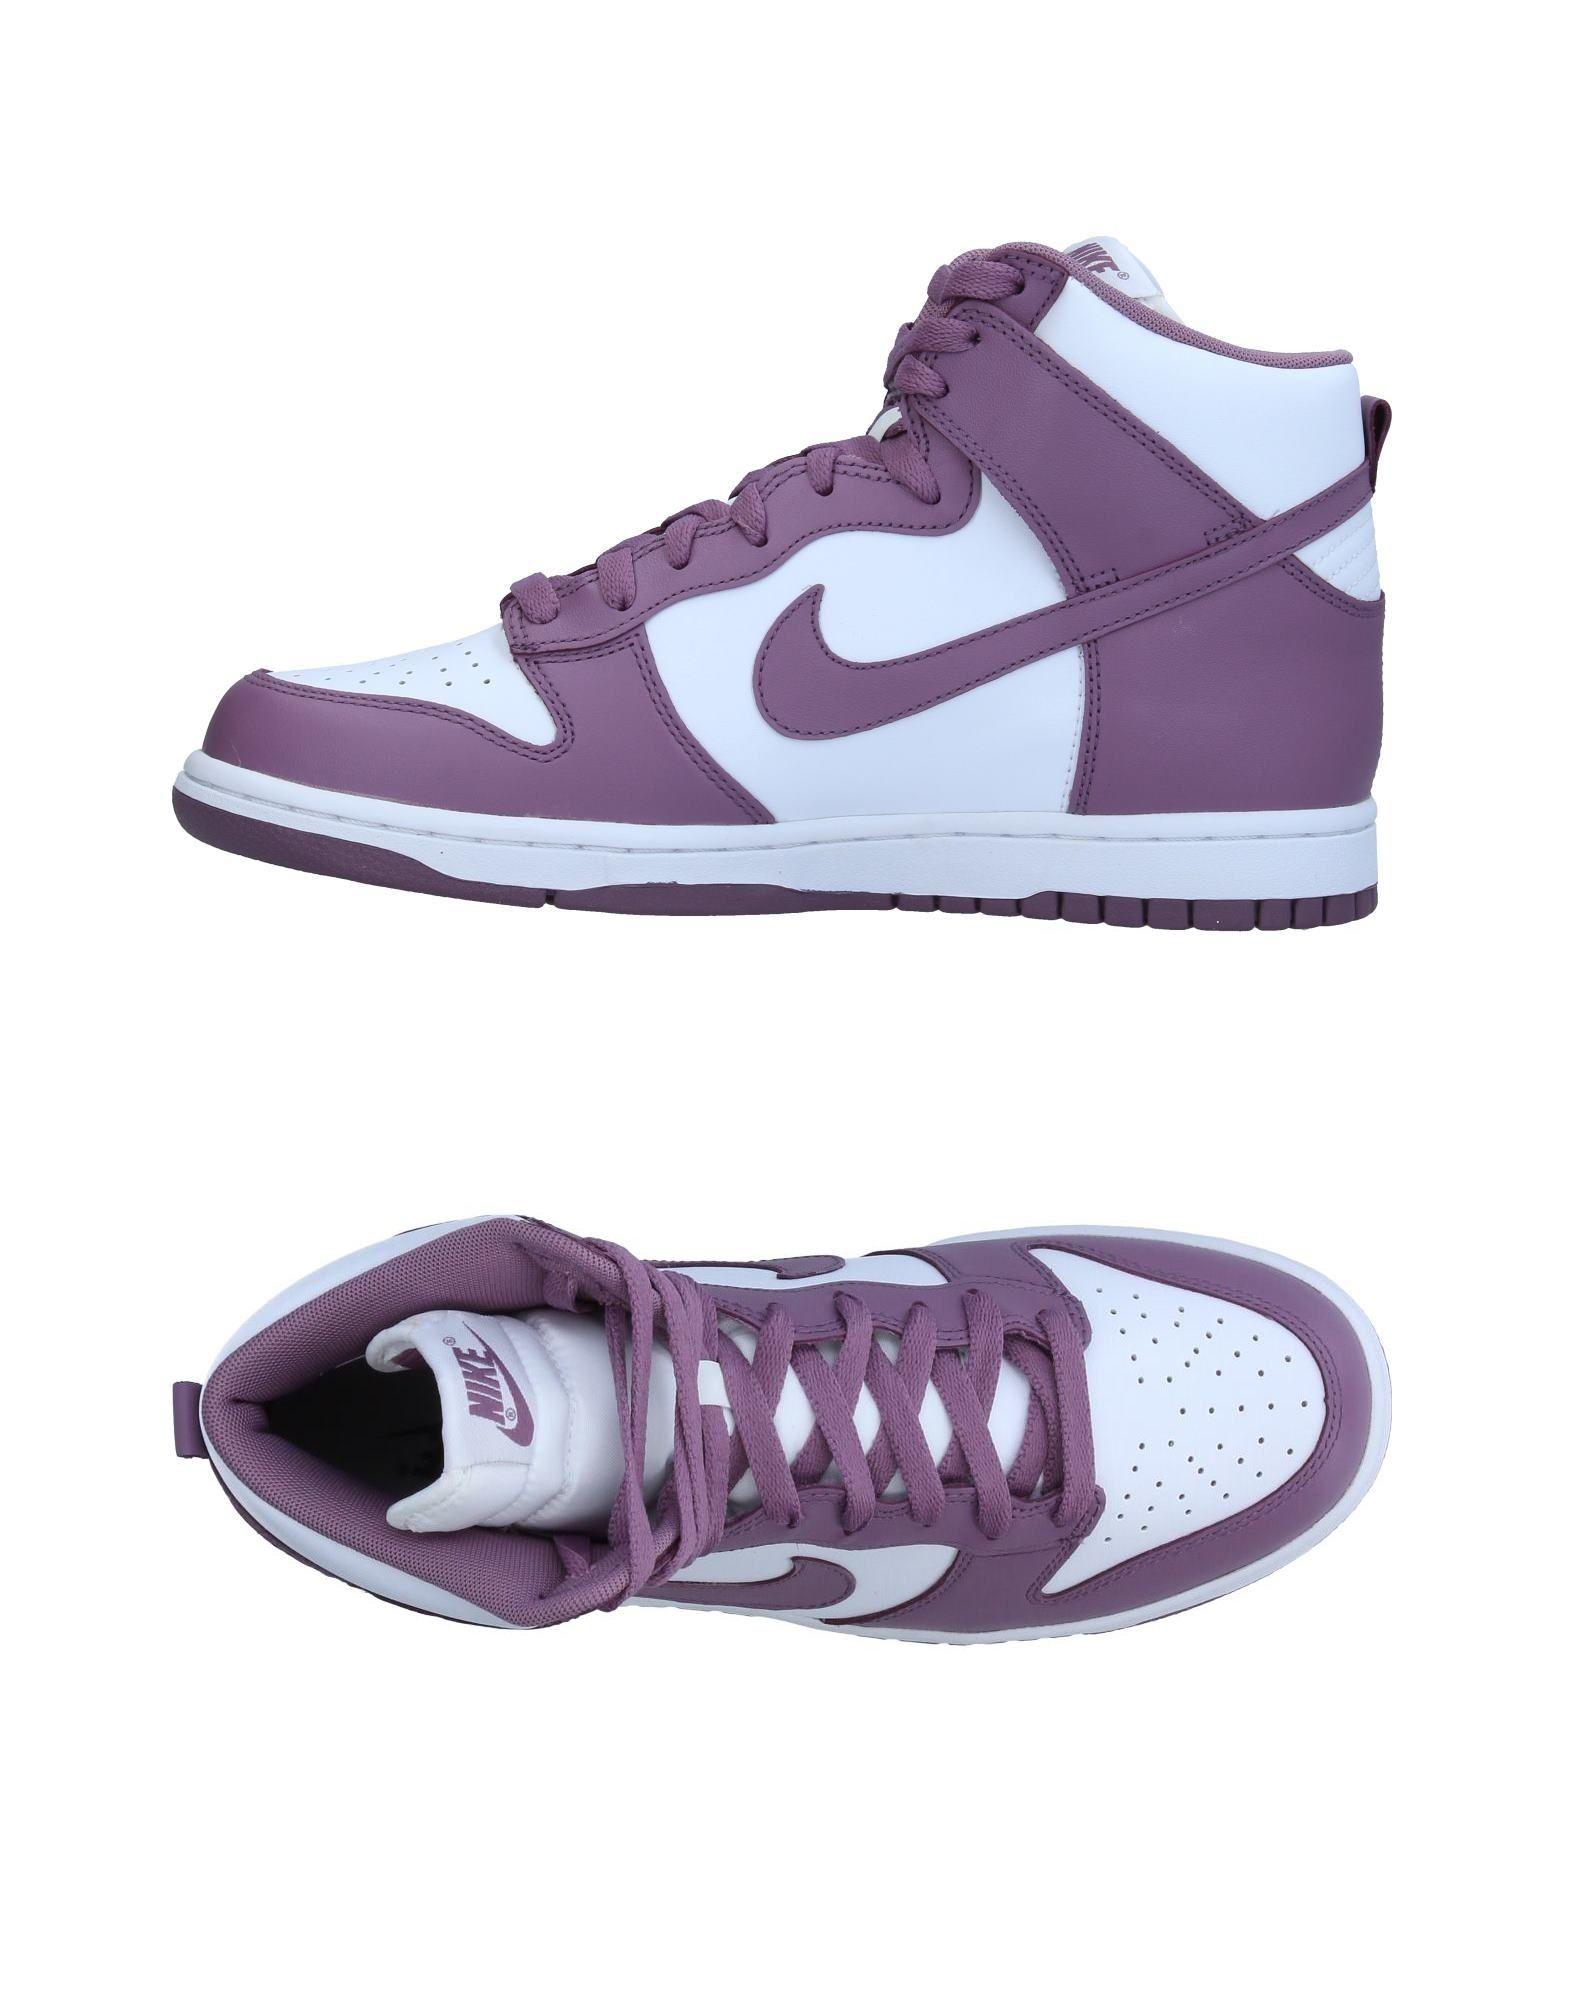 Moda Scarpe - da Ginnastica Nike Uomo - Scarpe 11375557MH 11c621